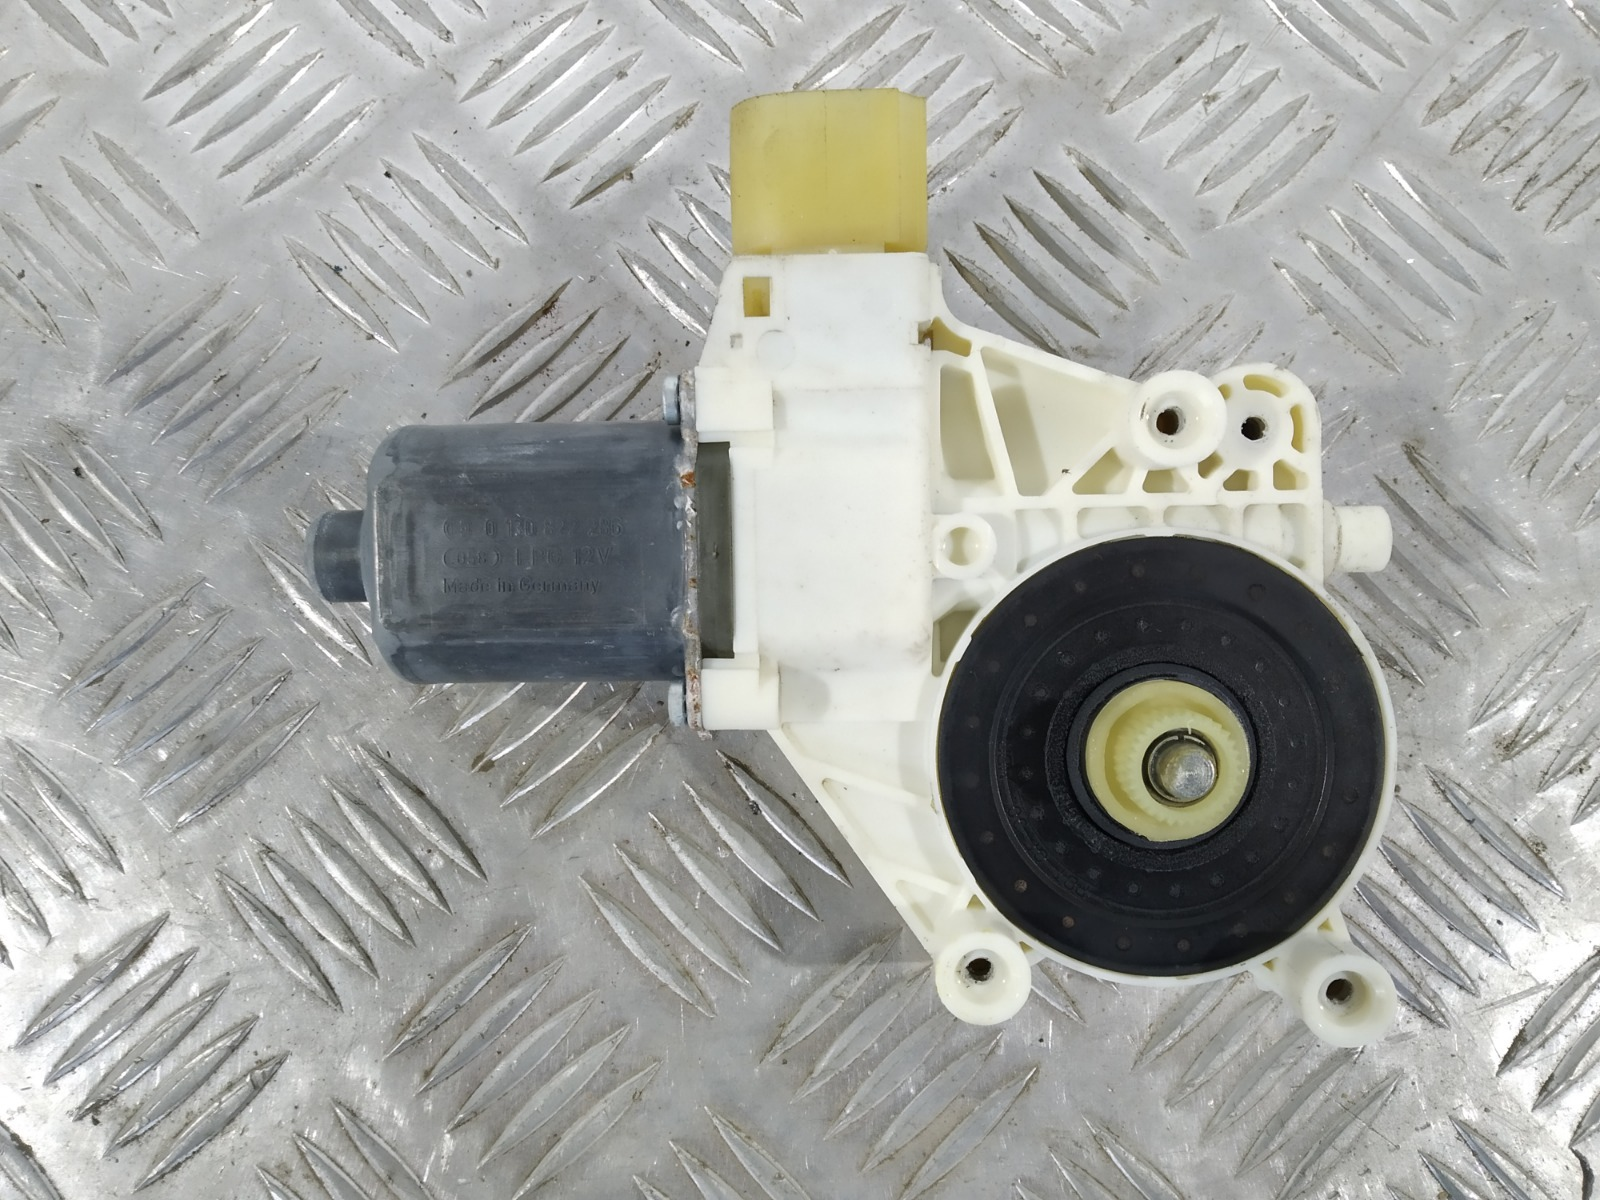 Моторчик стеклоподъемника передний правый Ford Mondeo 1.8 2009 (б/у)